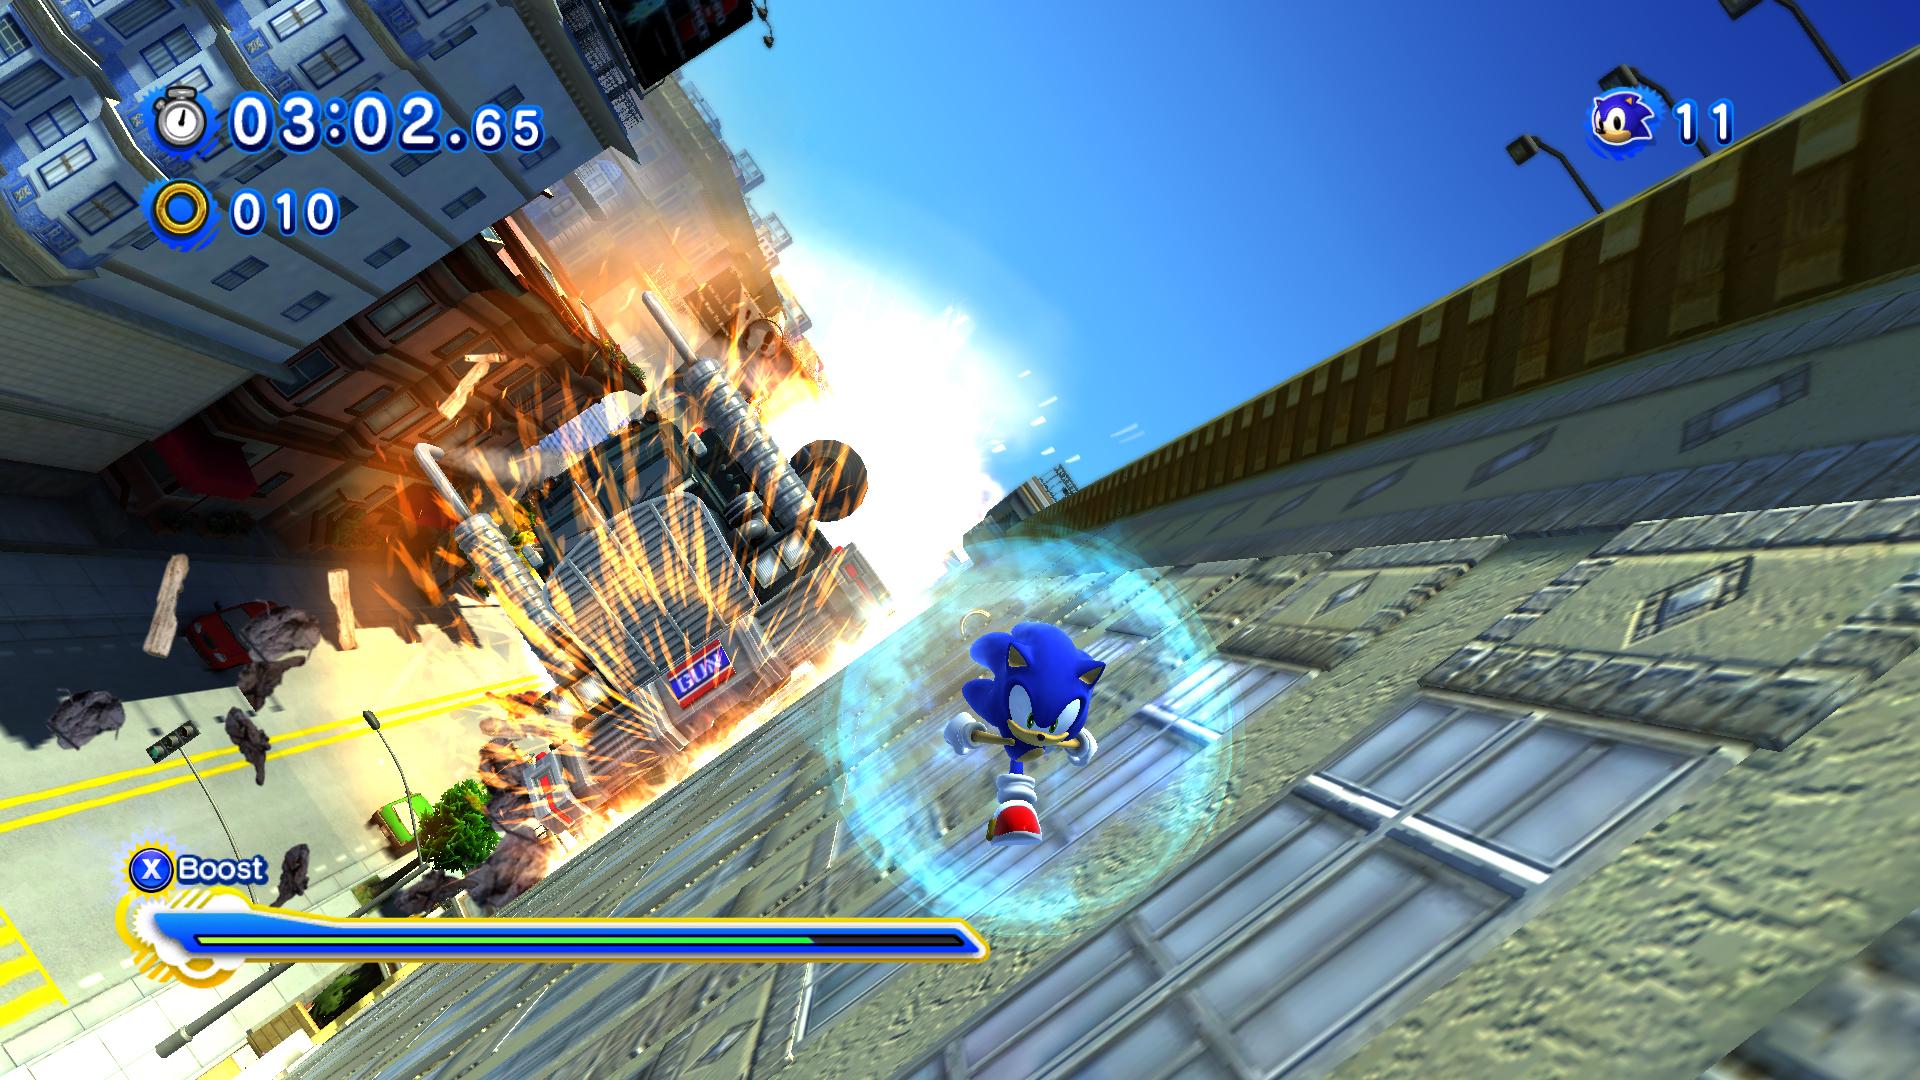 Sonic generations xbox 360 demo download | digiex.